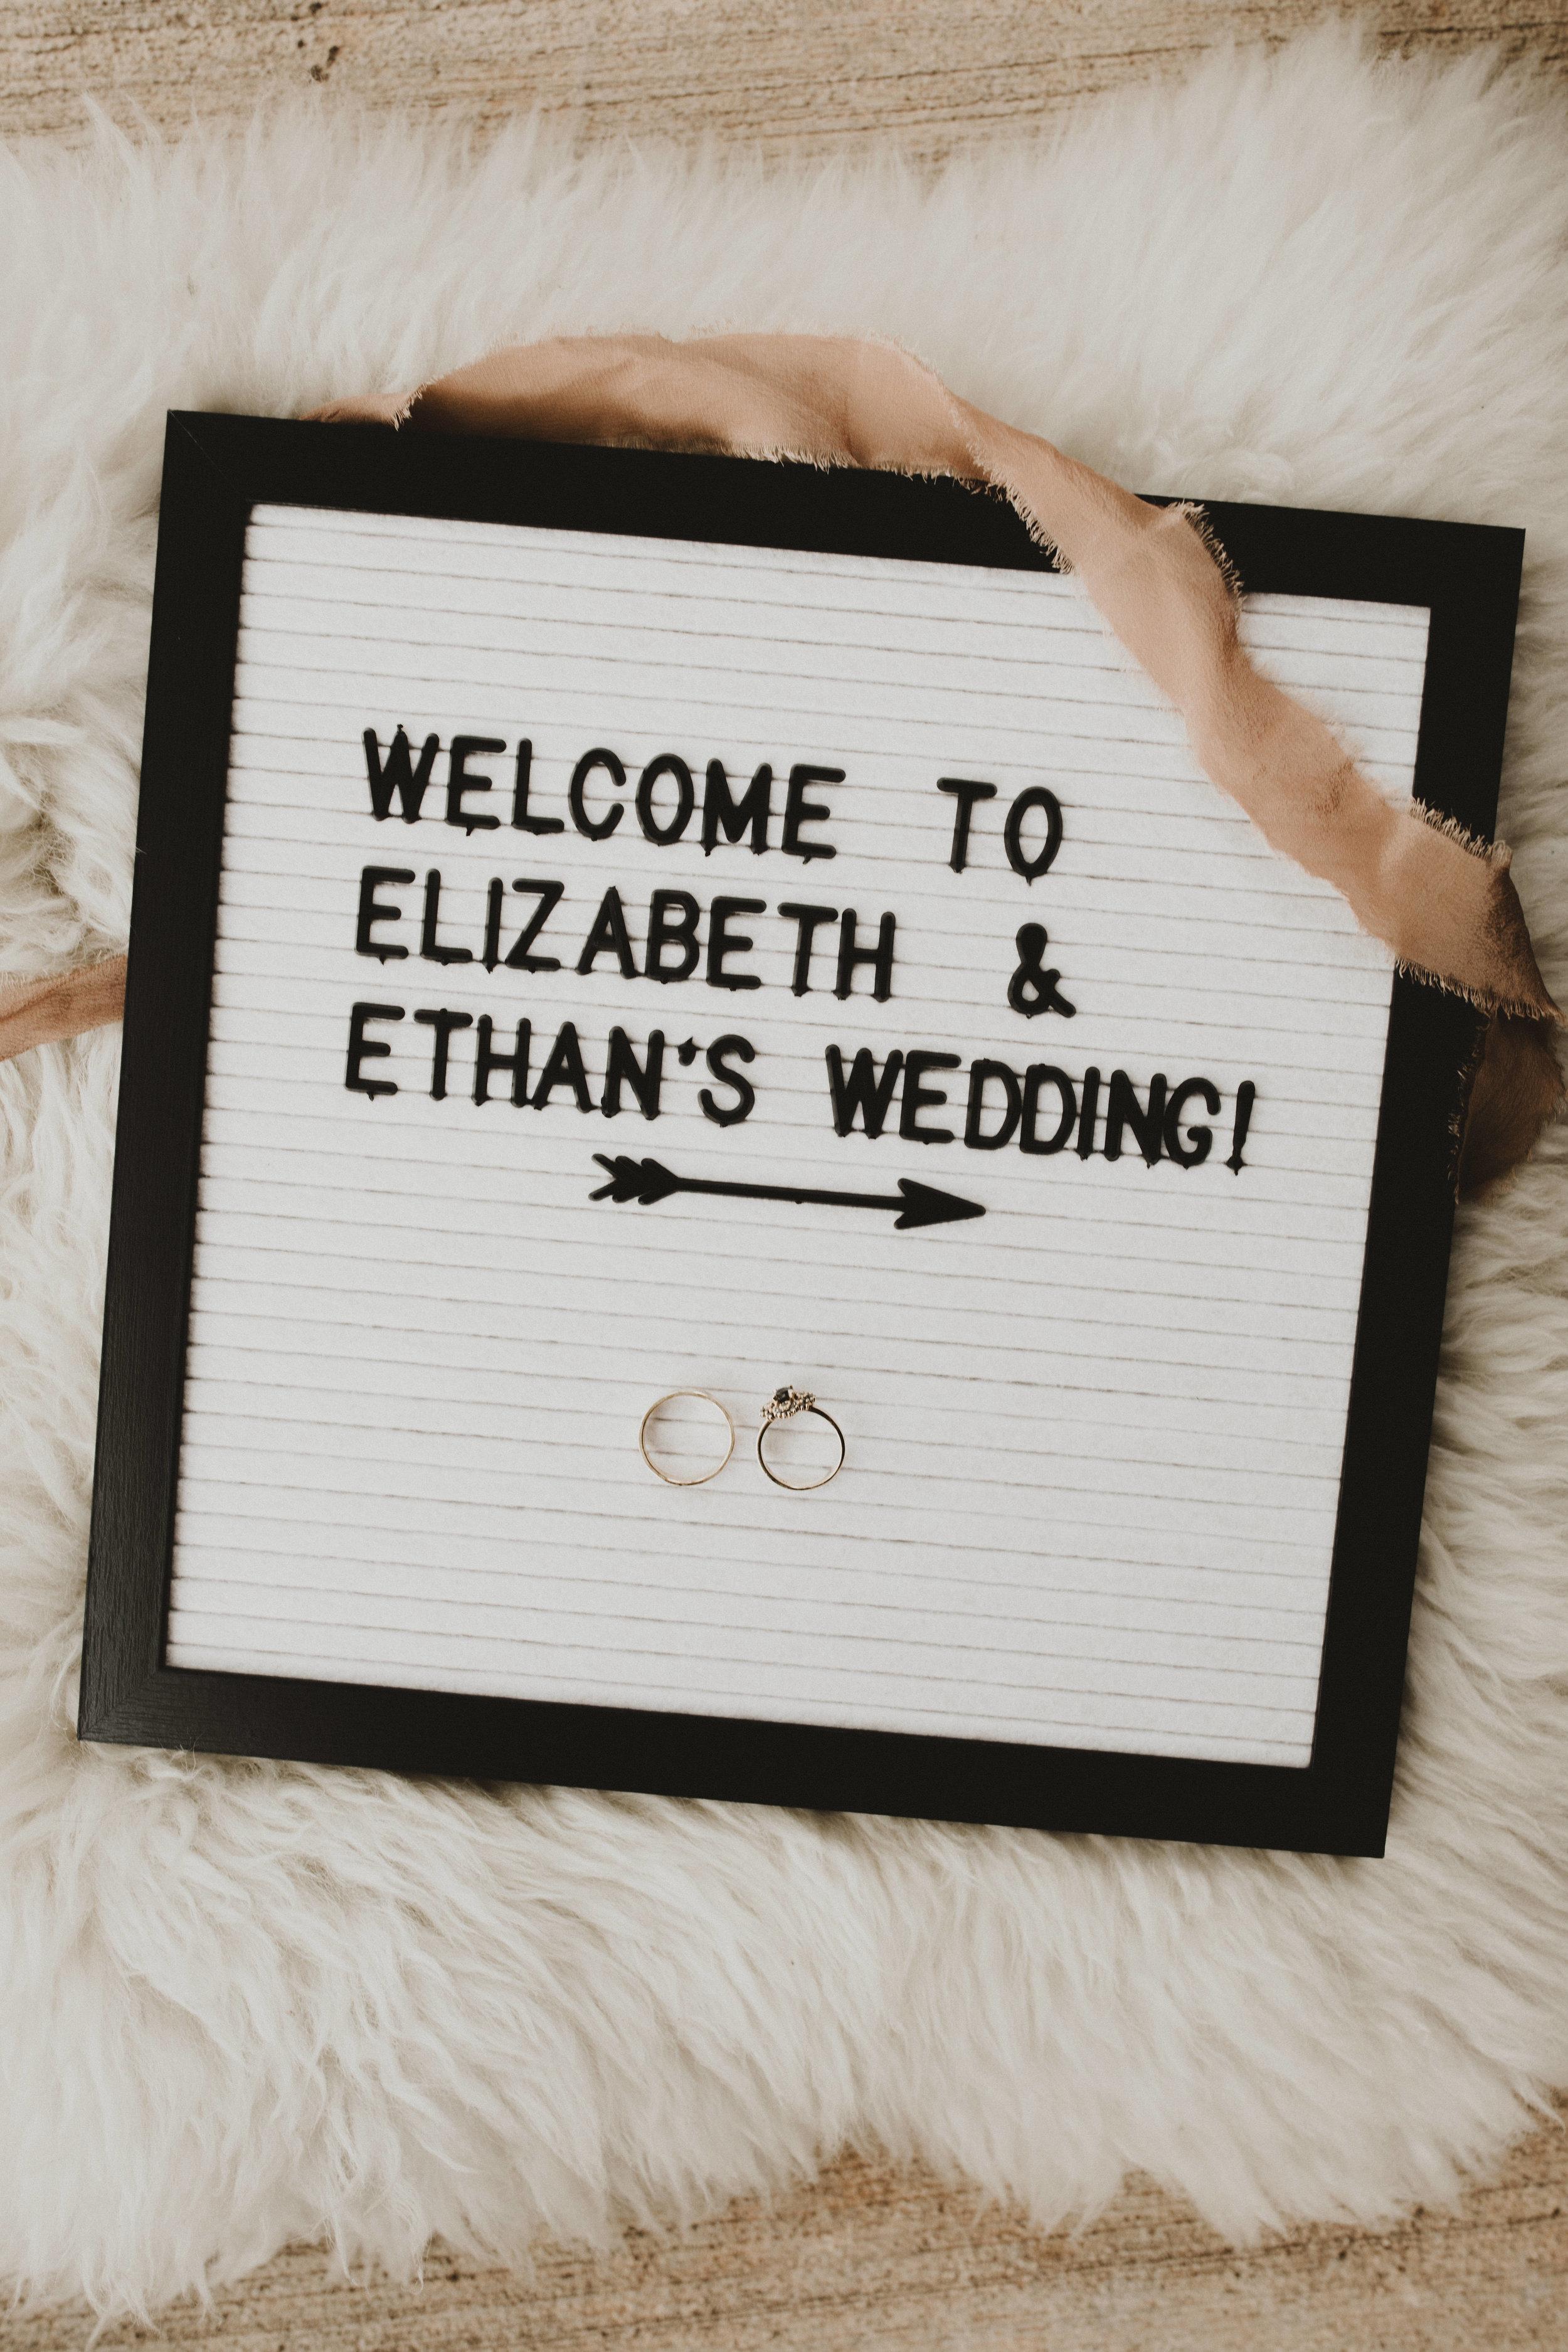 ElizabethEthan_Blog_014.jpg